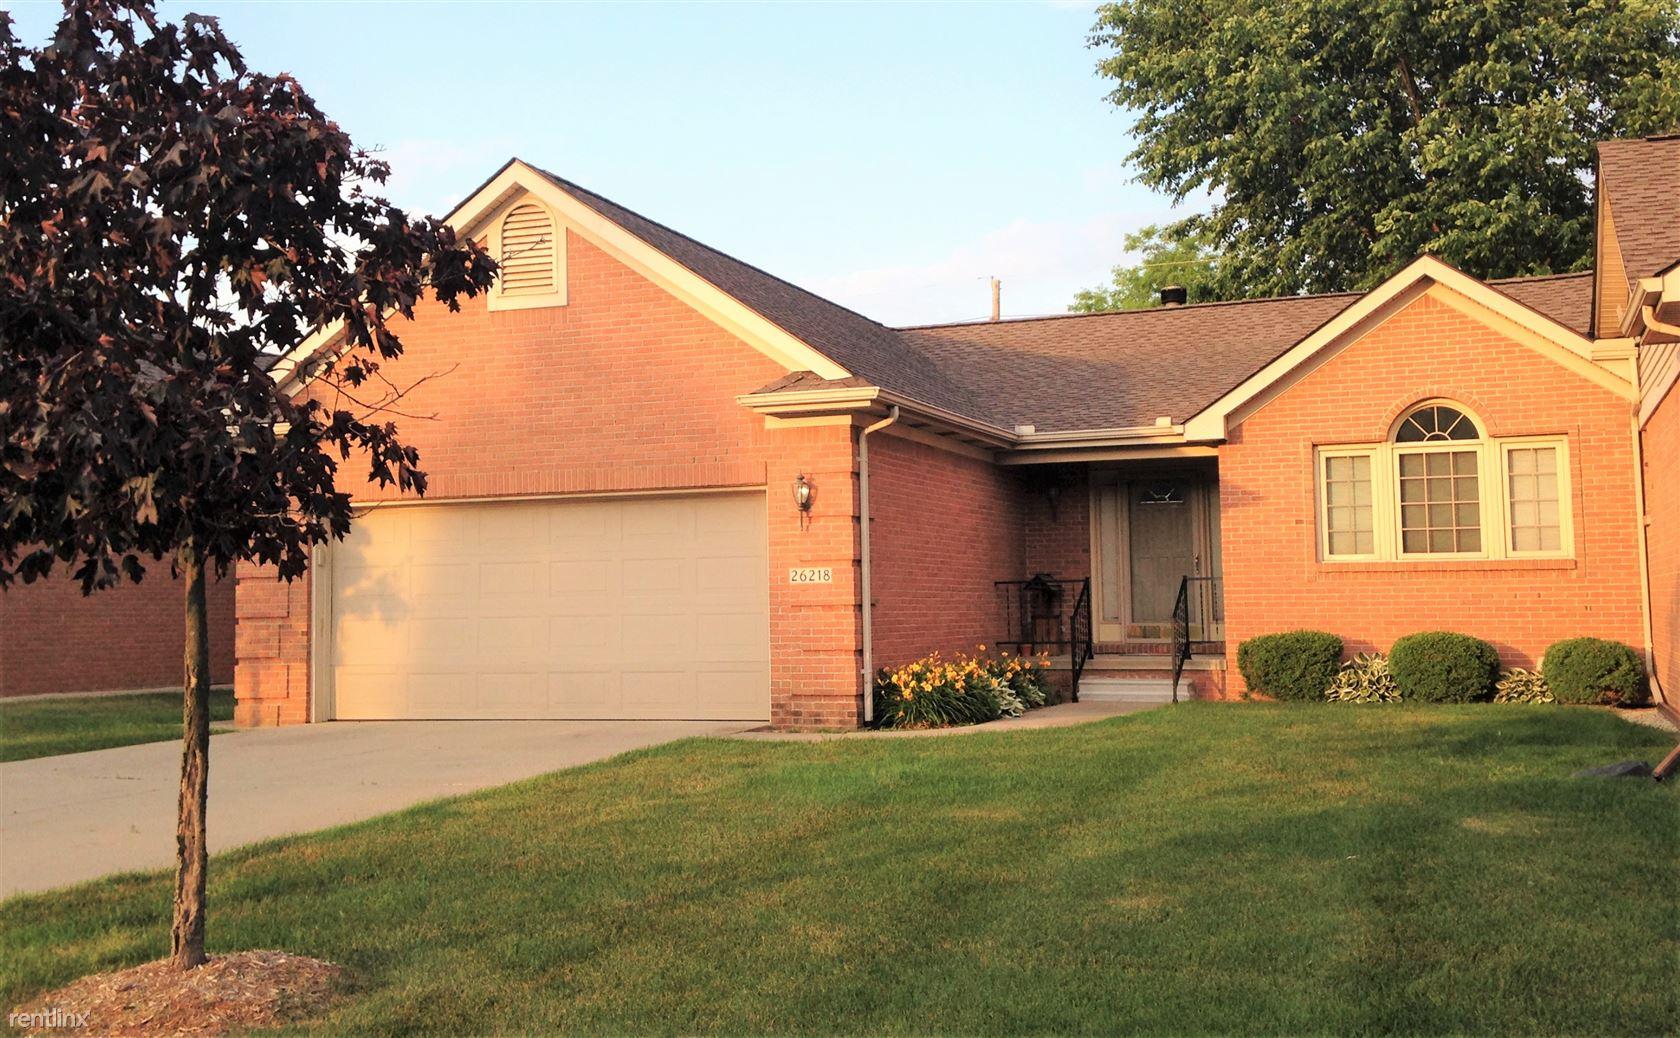 26218 Orchard Lake Rd, Farmington Hills, MI - $1,600